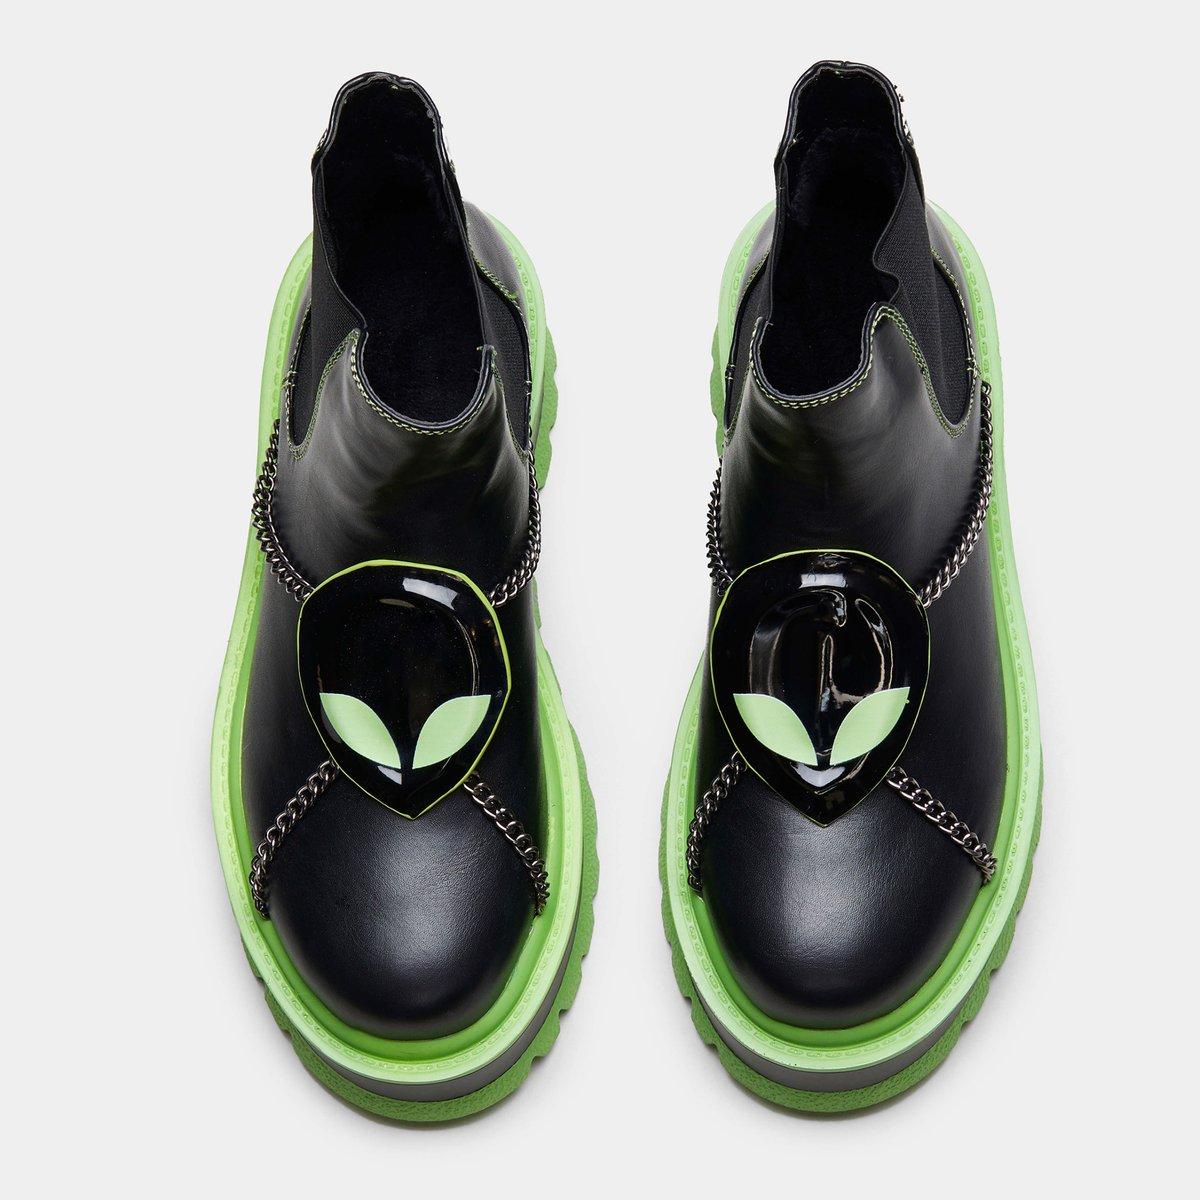 aad495213a Koi Footwear (@KoiFootwear) | Twitter koi footwear returns